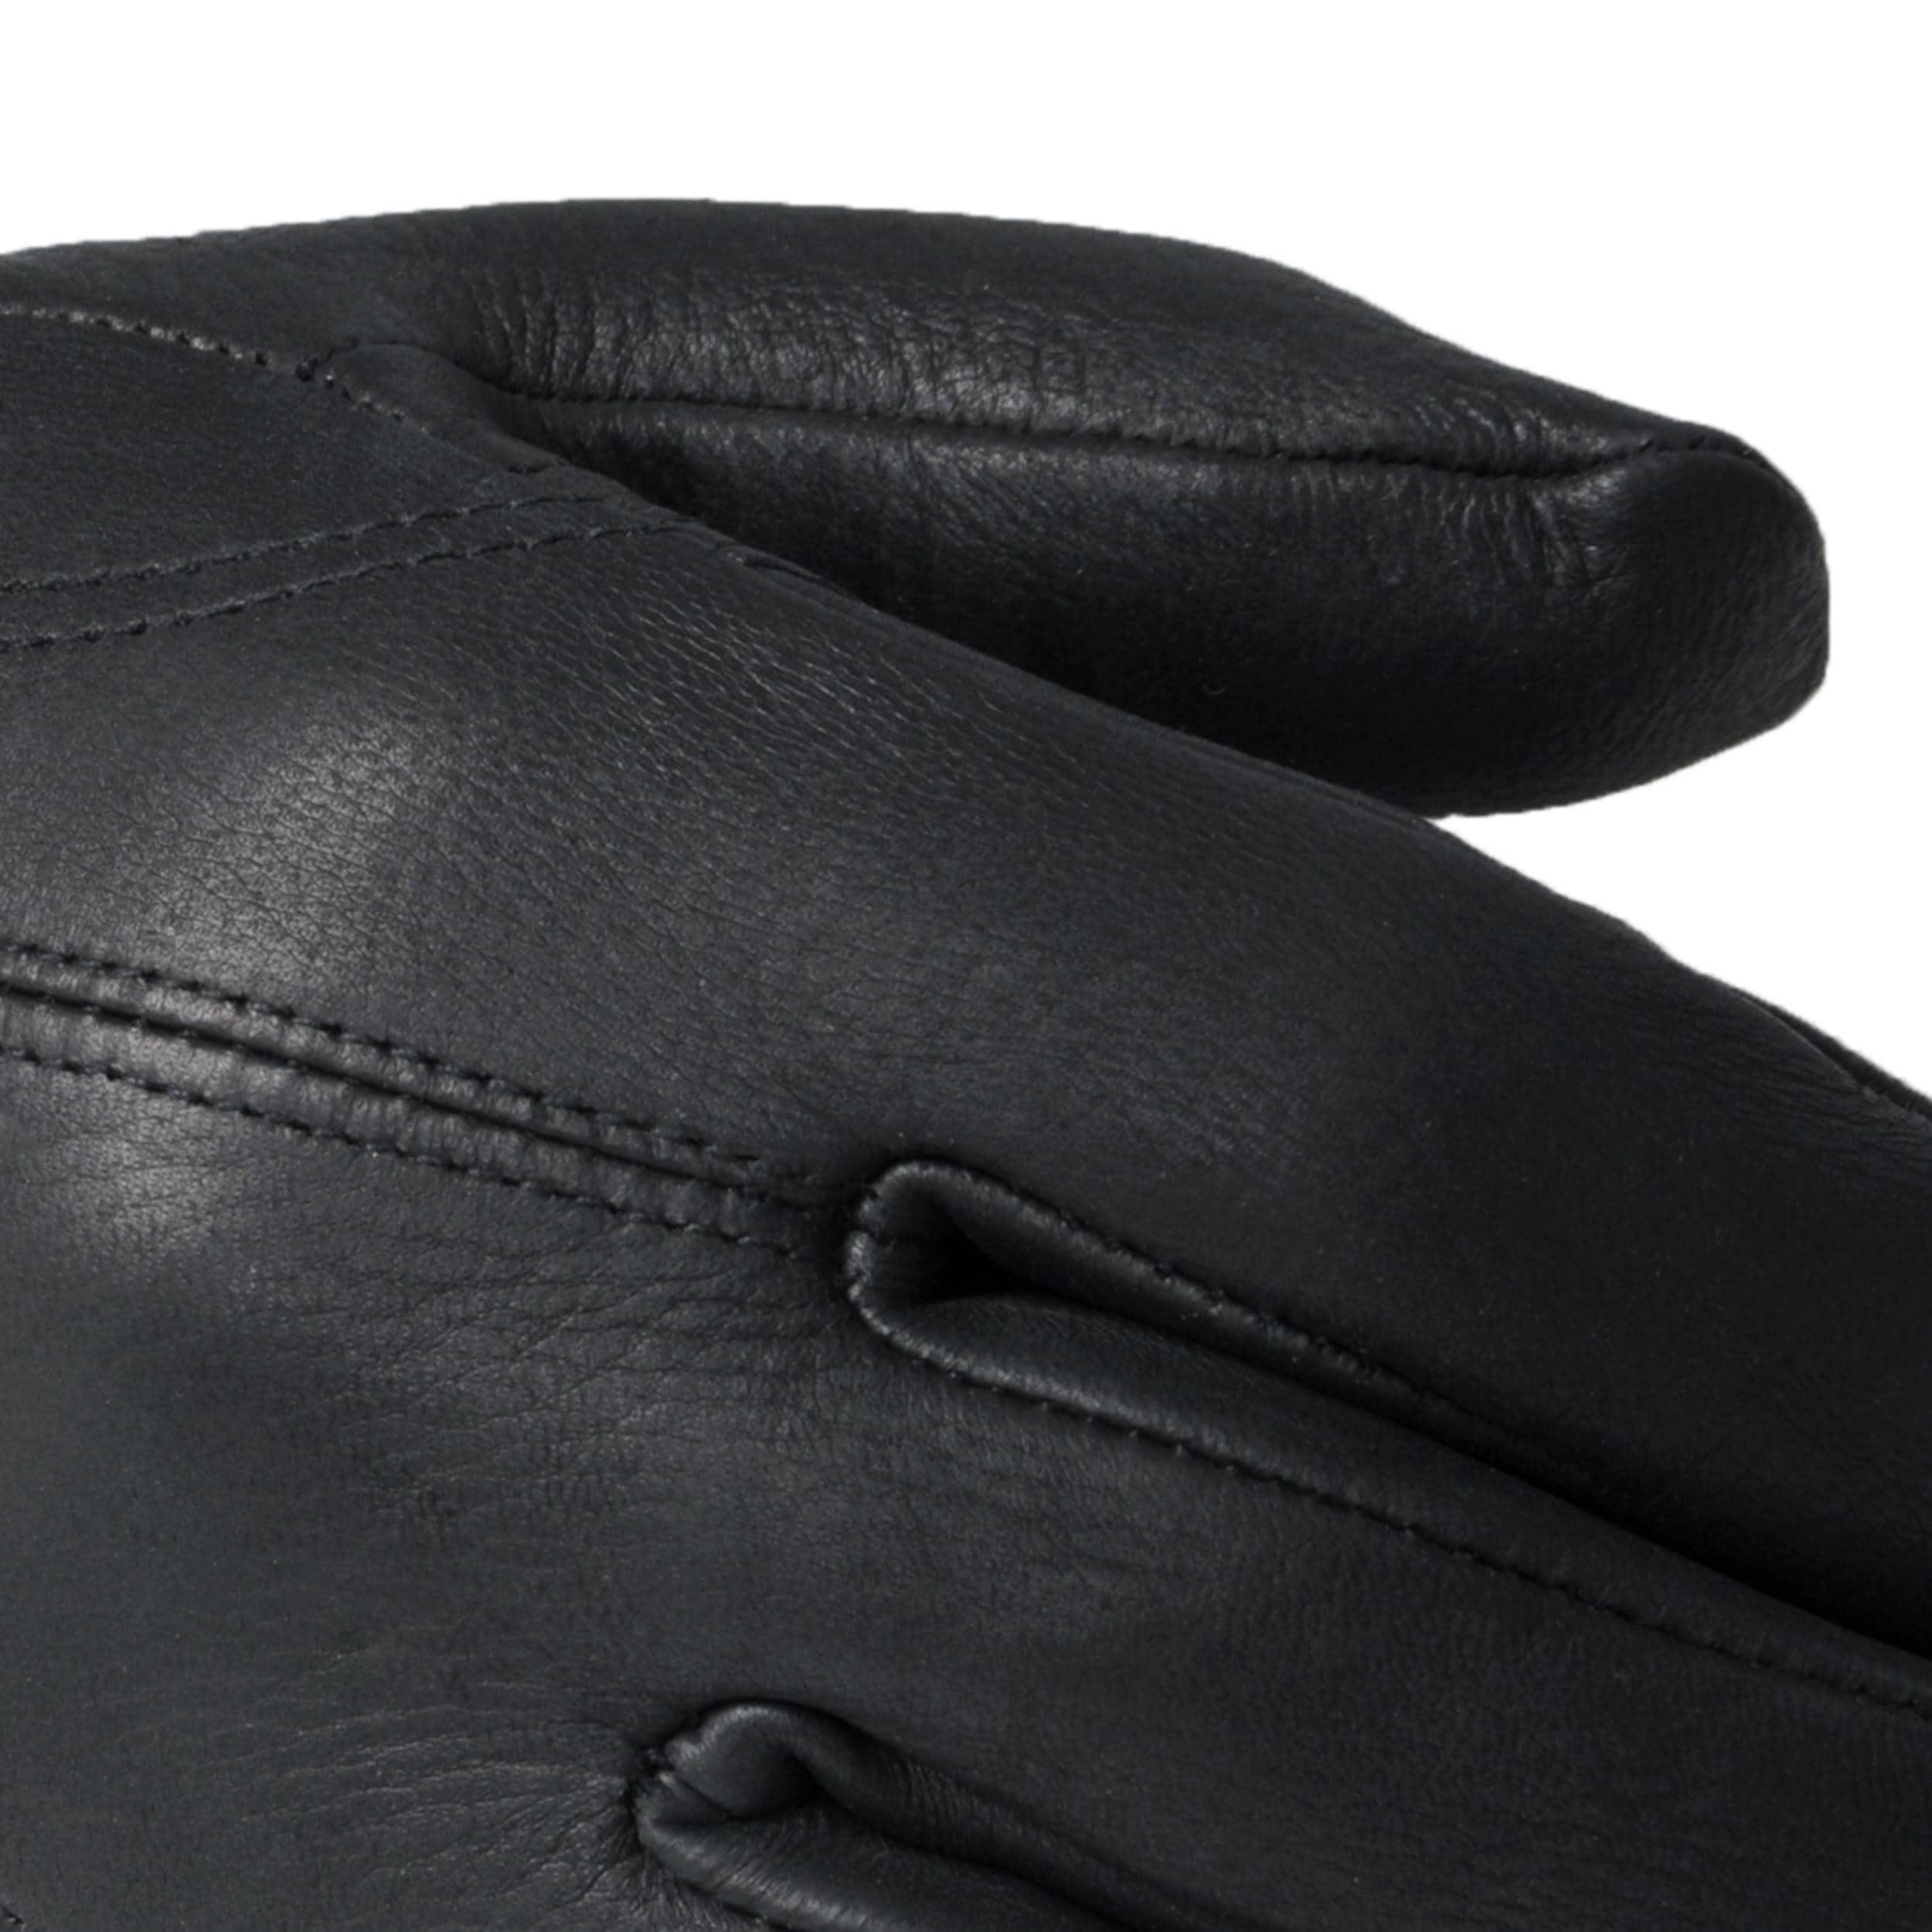 Overstock mens leather gloves -  Daxx Men S Lined Top Grain Deerskin Leather Gloves